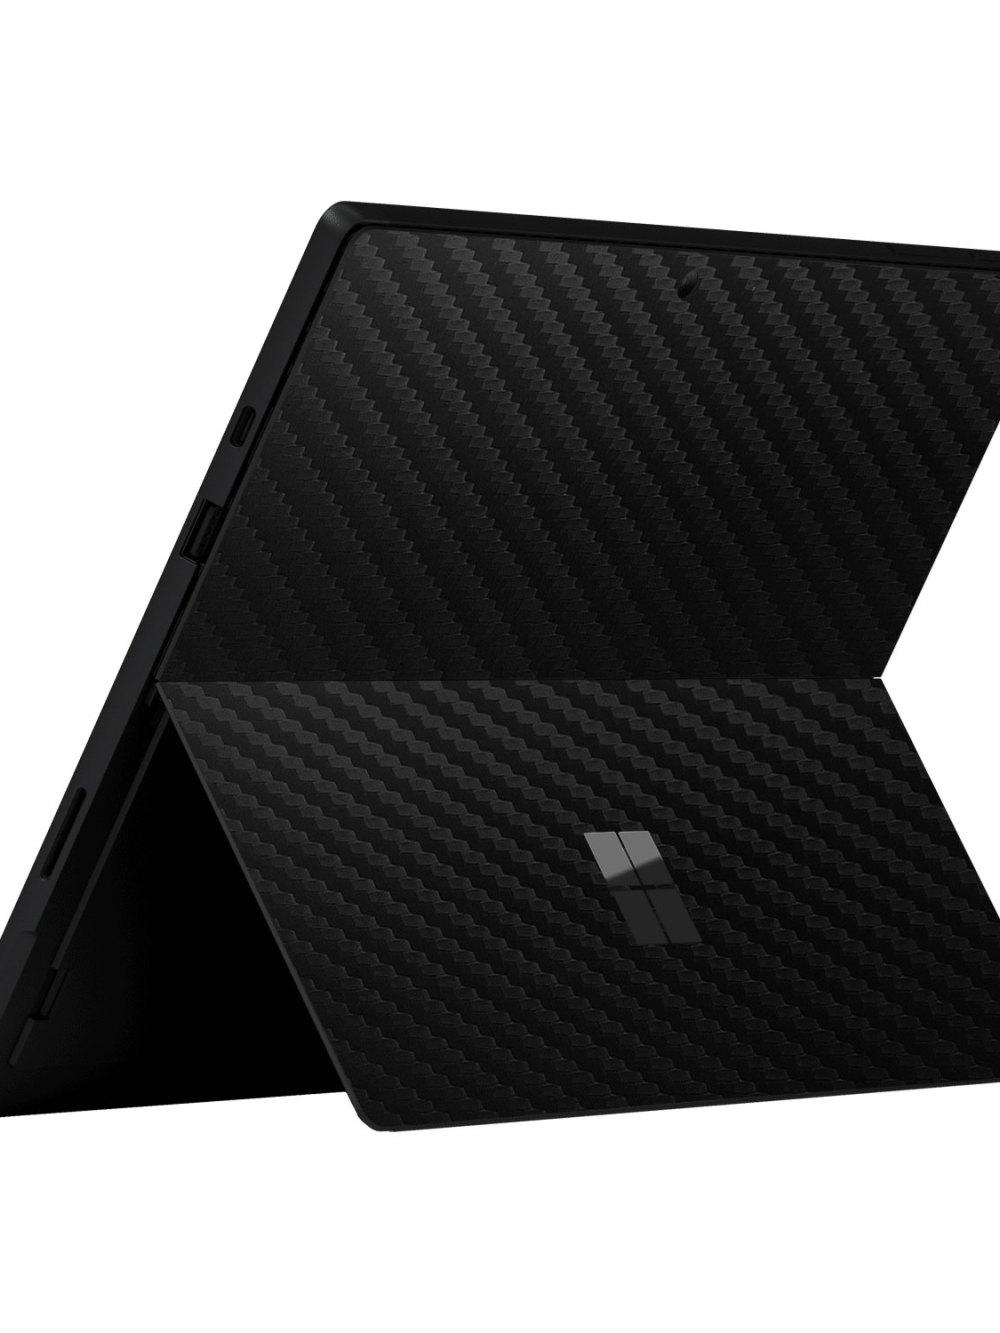 Microsoft Surface Pro 7 Skins & Wraps